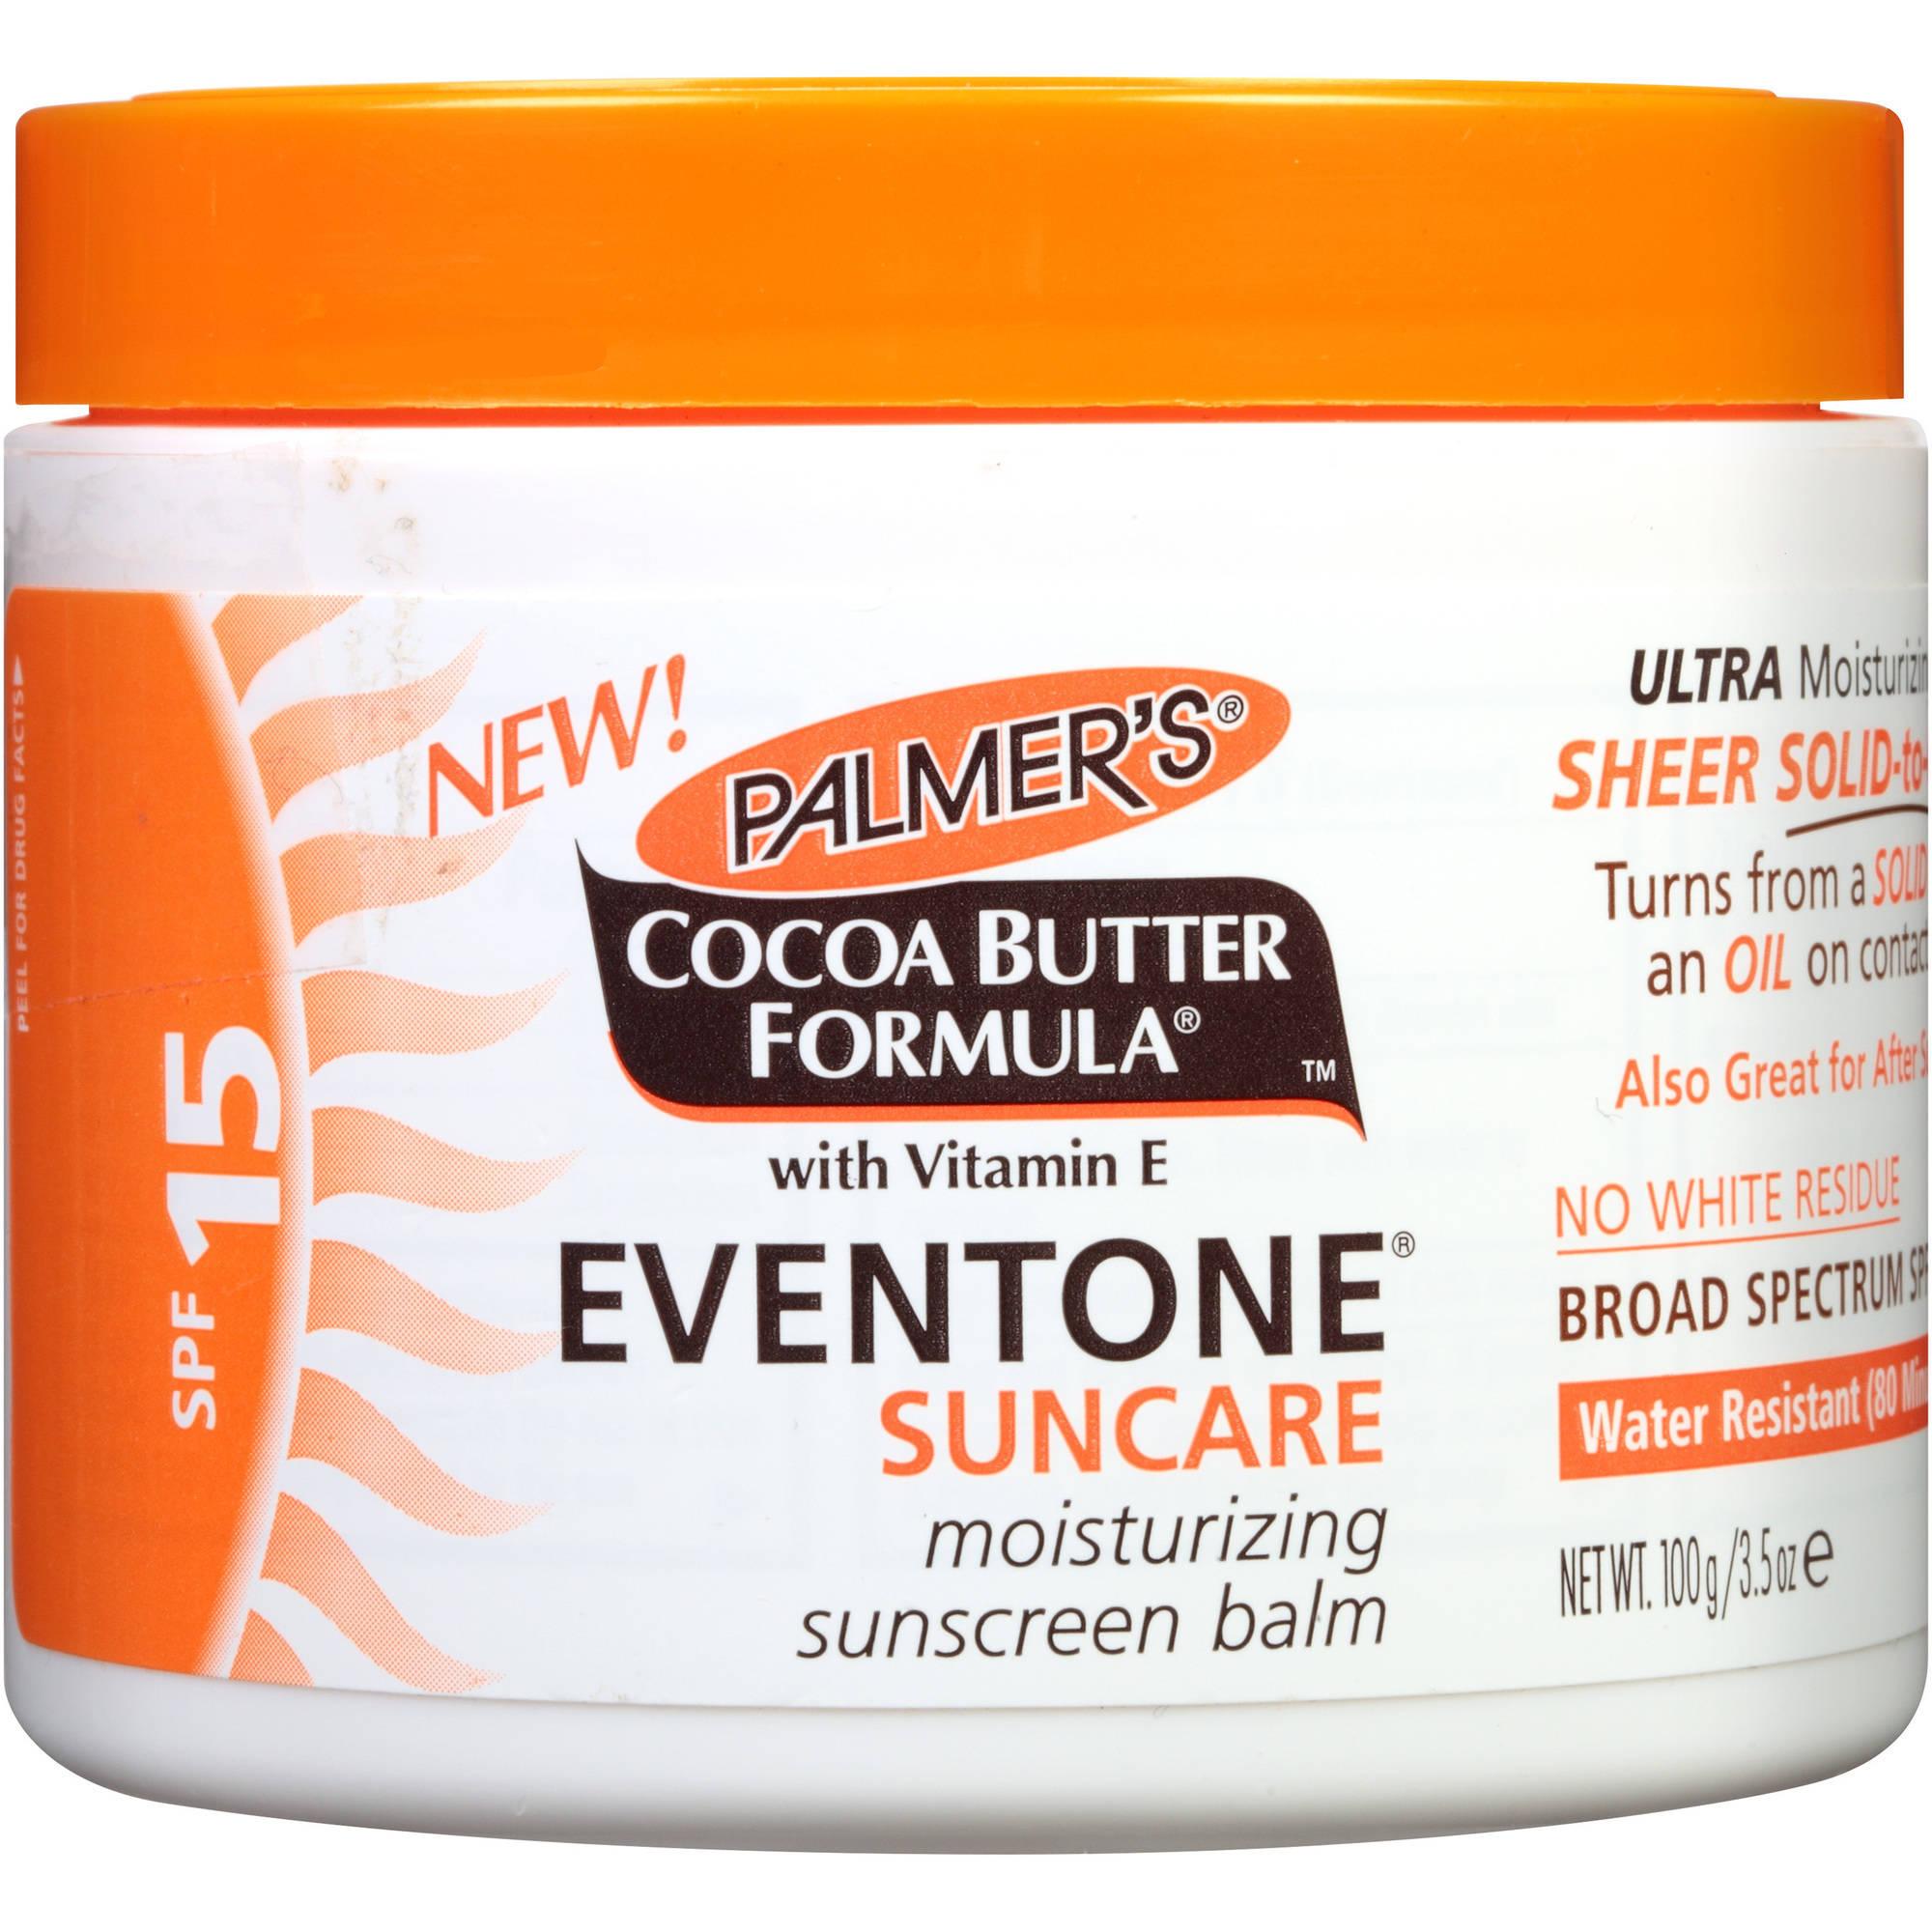 Palmer's Cocoa Butter Formula Eventone Suncare Moisturizing Sunscreen Balm, 3.5 oz